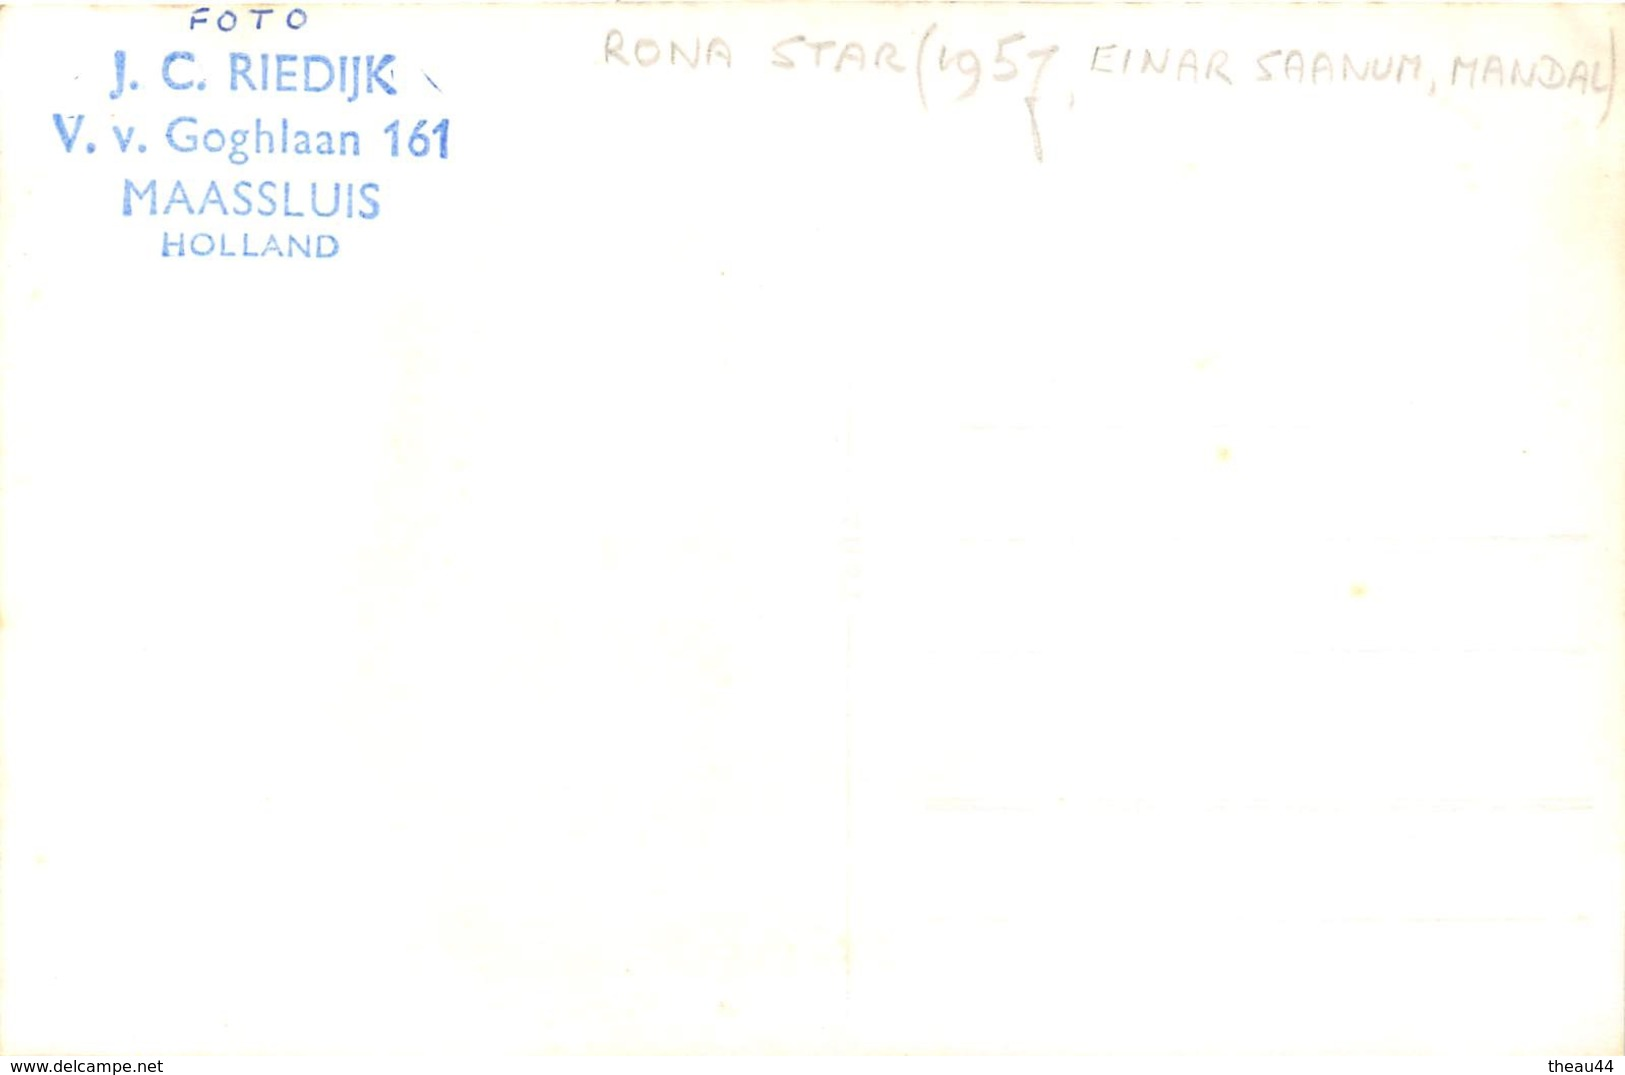 "¤¤  -   Carte-Photo Du Bateau De Commerce "" RONA STAR "" -  Cargo    -  ¤¤ - Commerce"